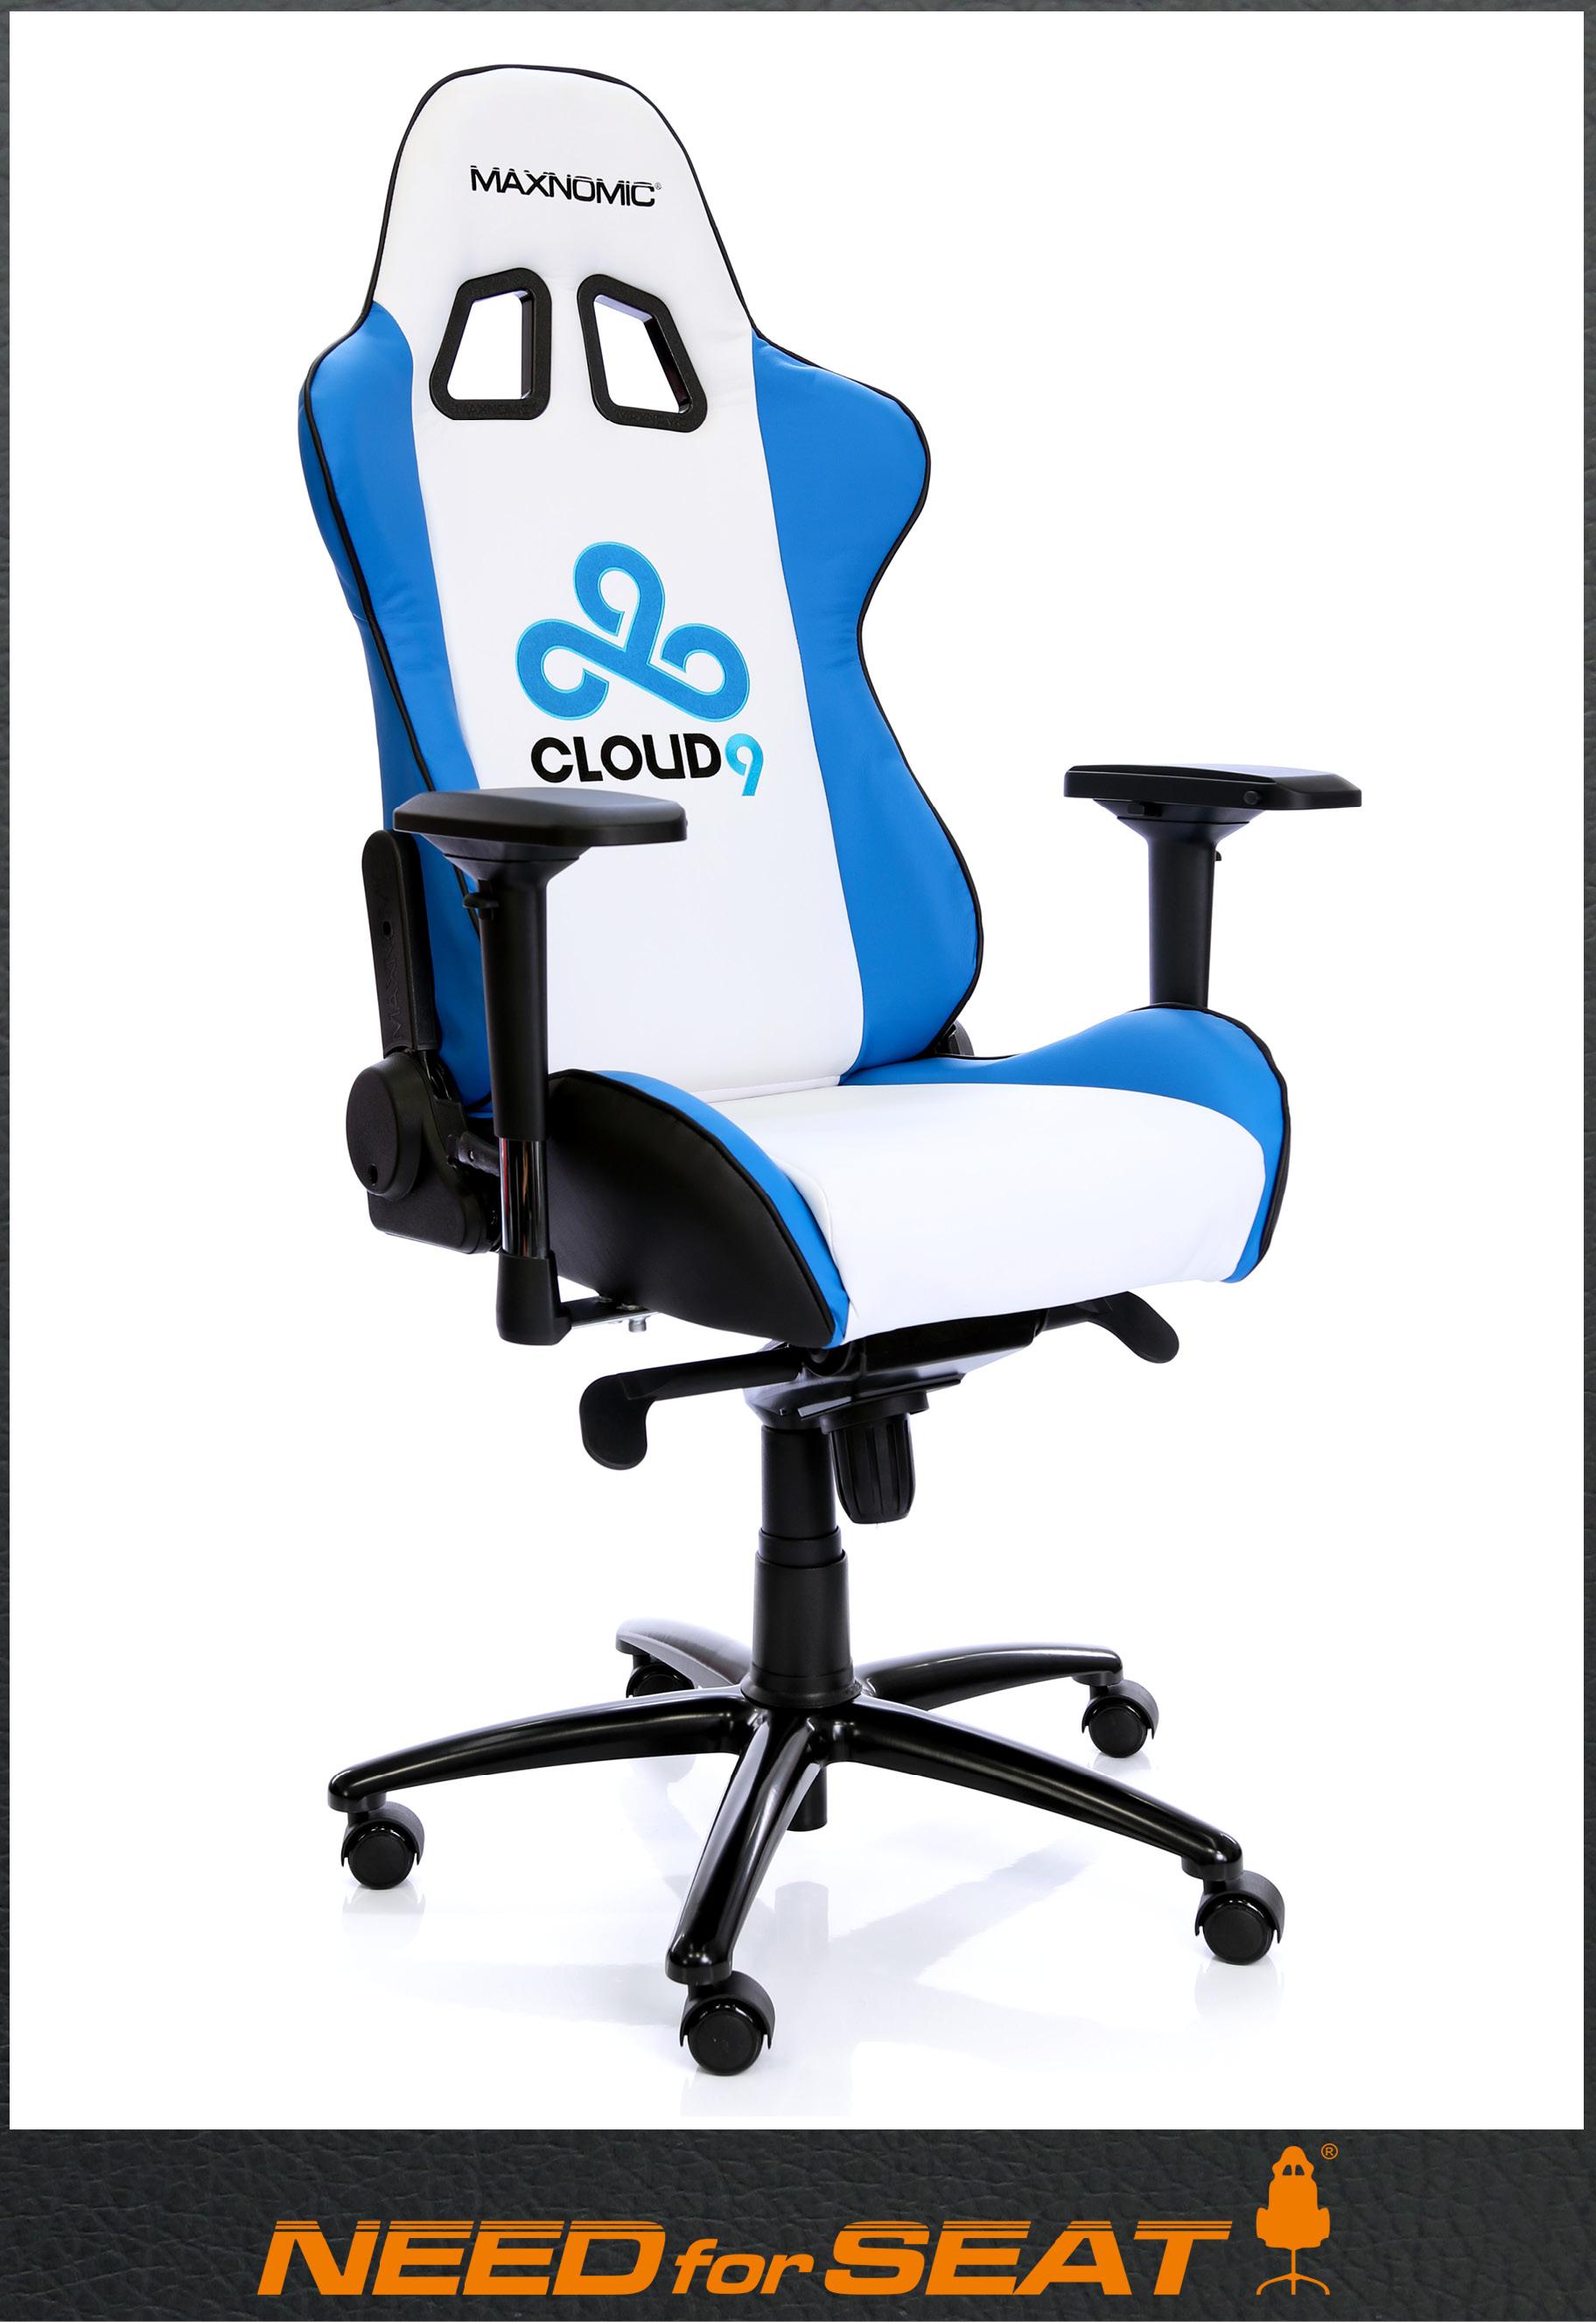 MAXNOMIC CLOUD9 CAS online kaufen